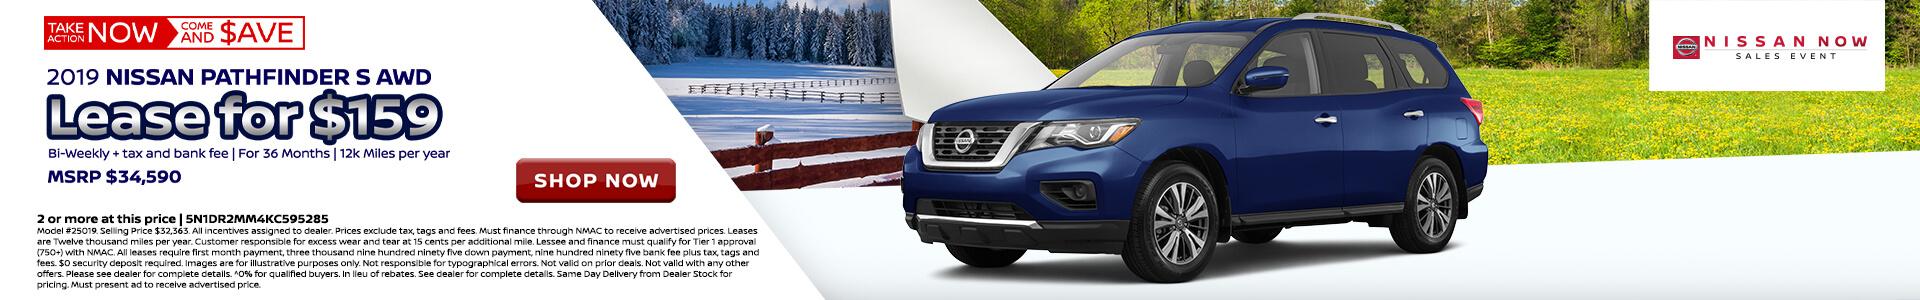 Nissan Pathfinder $318 Lease